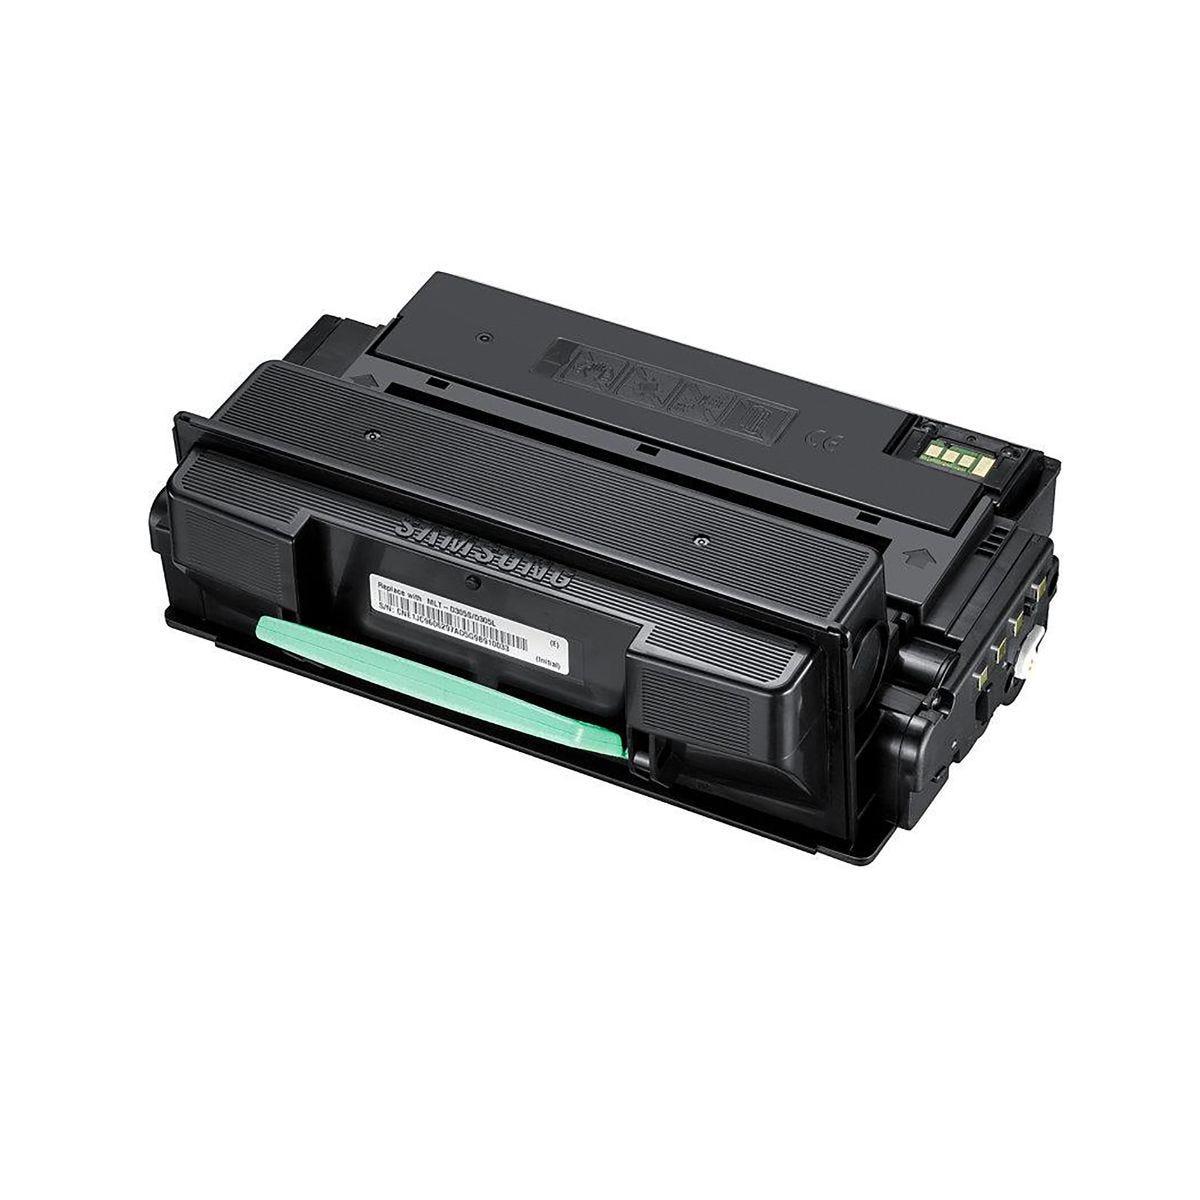 Samsung ML3750ND Toner